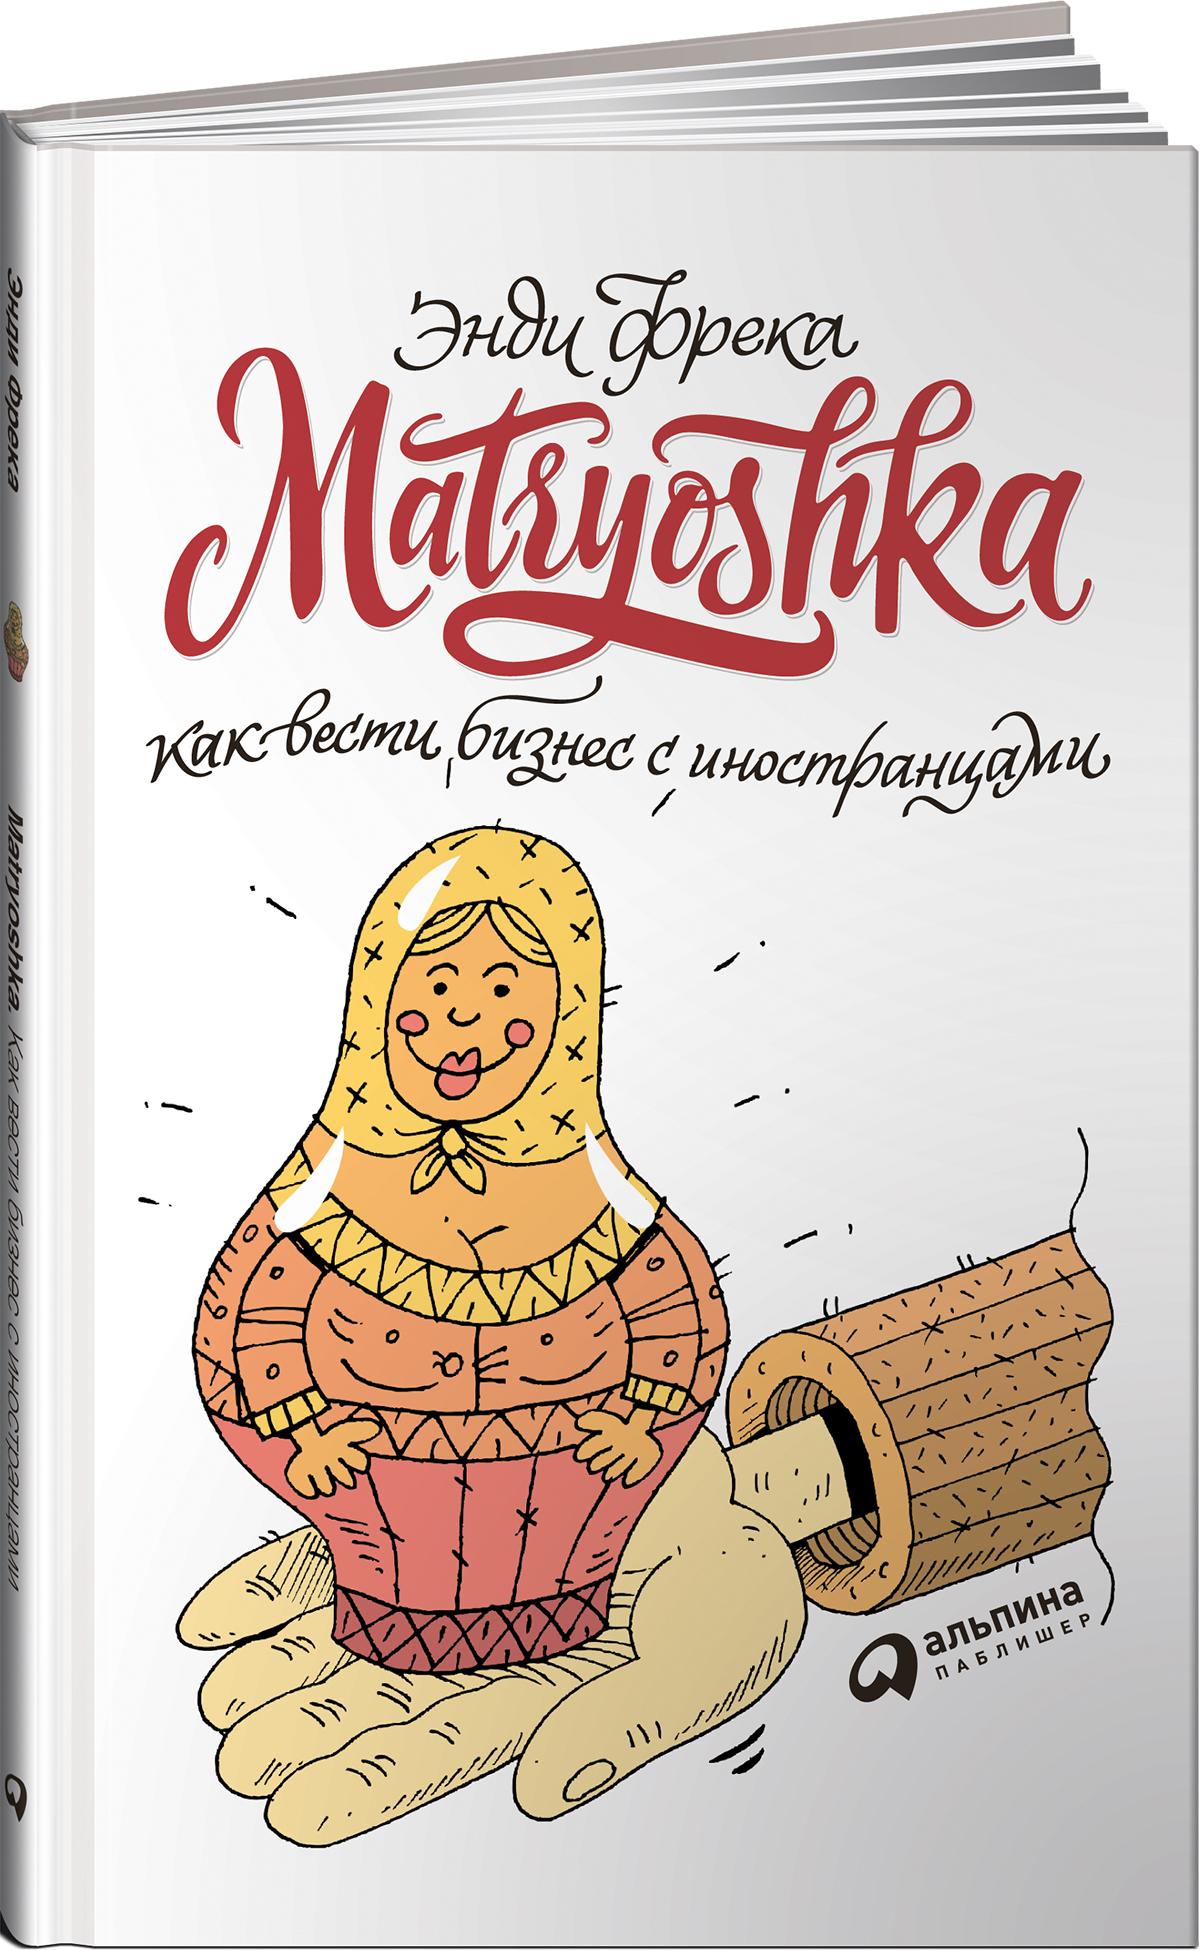 Книга Matryoshka. Как вести бизнес с иностранцами. Энди Фрека